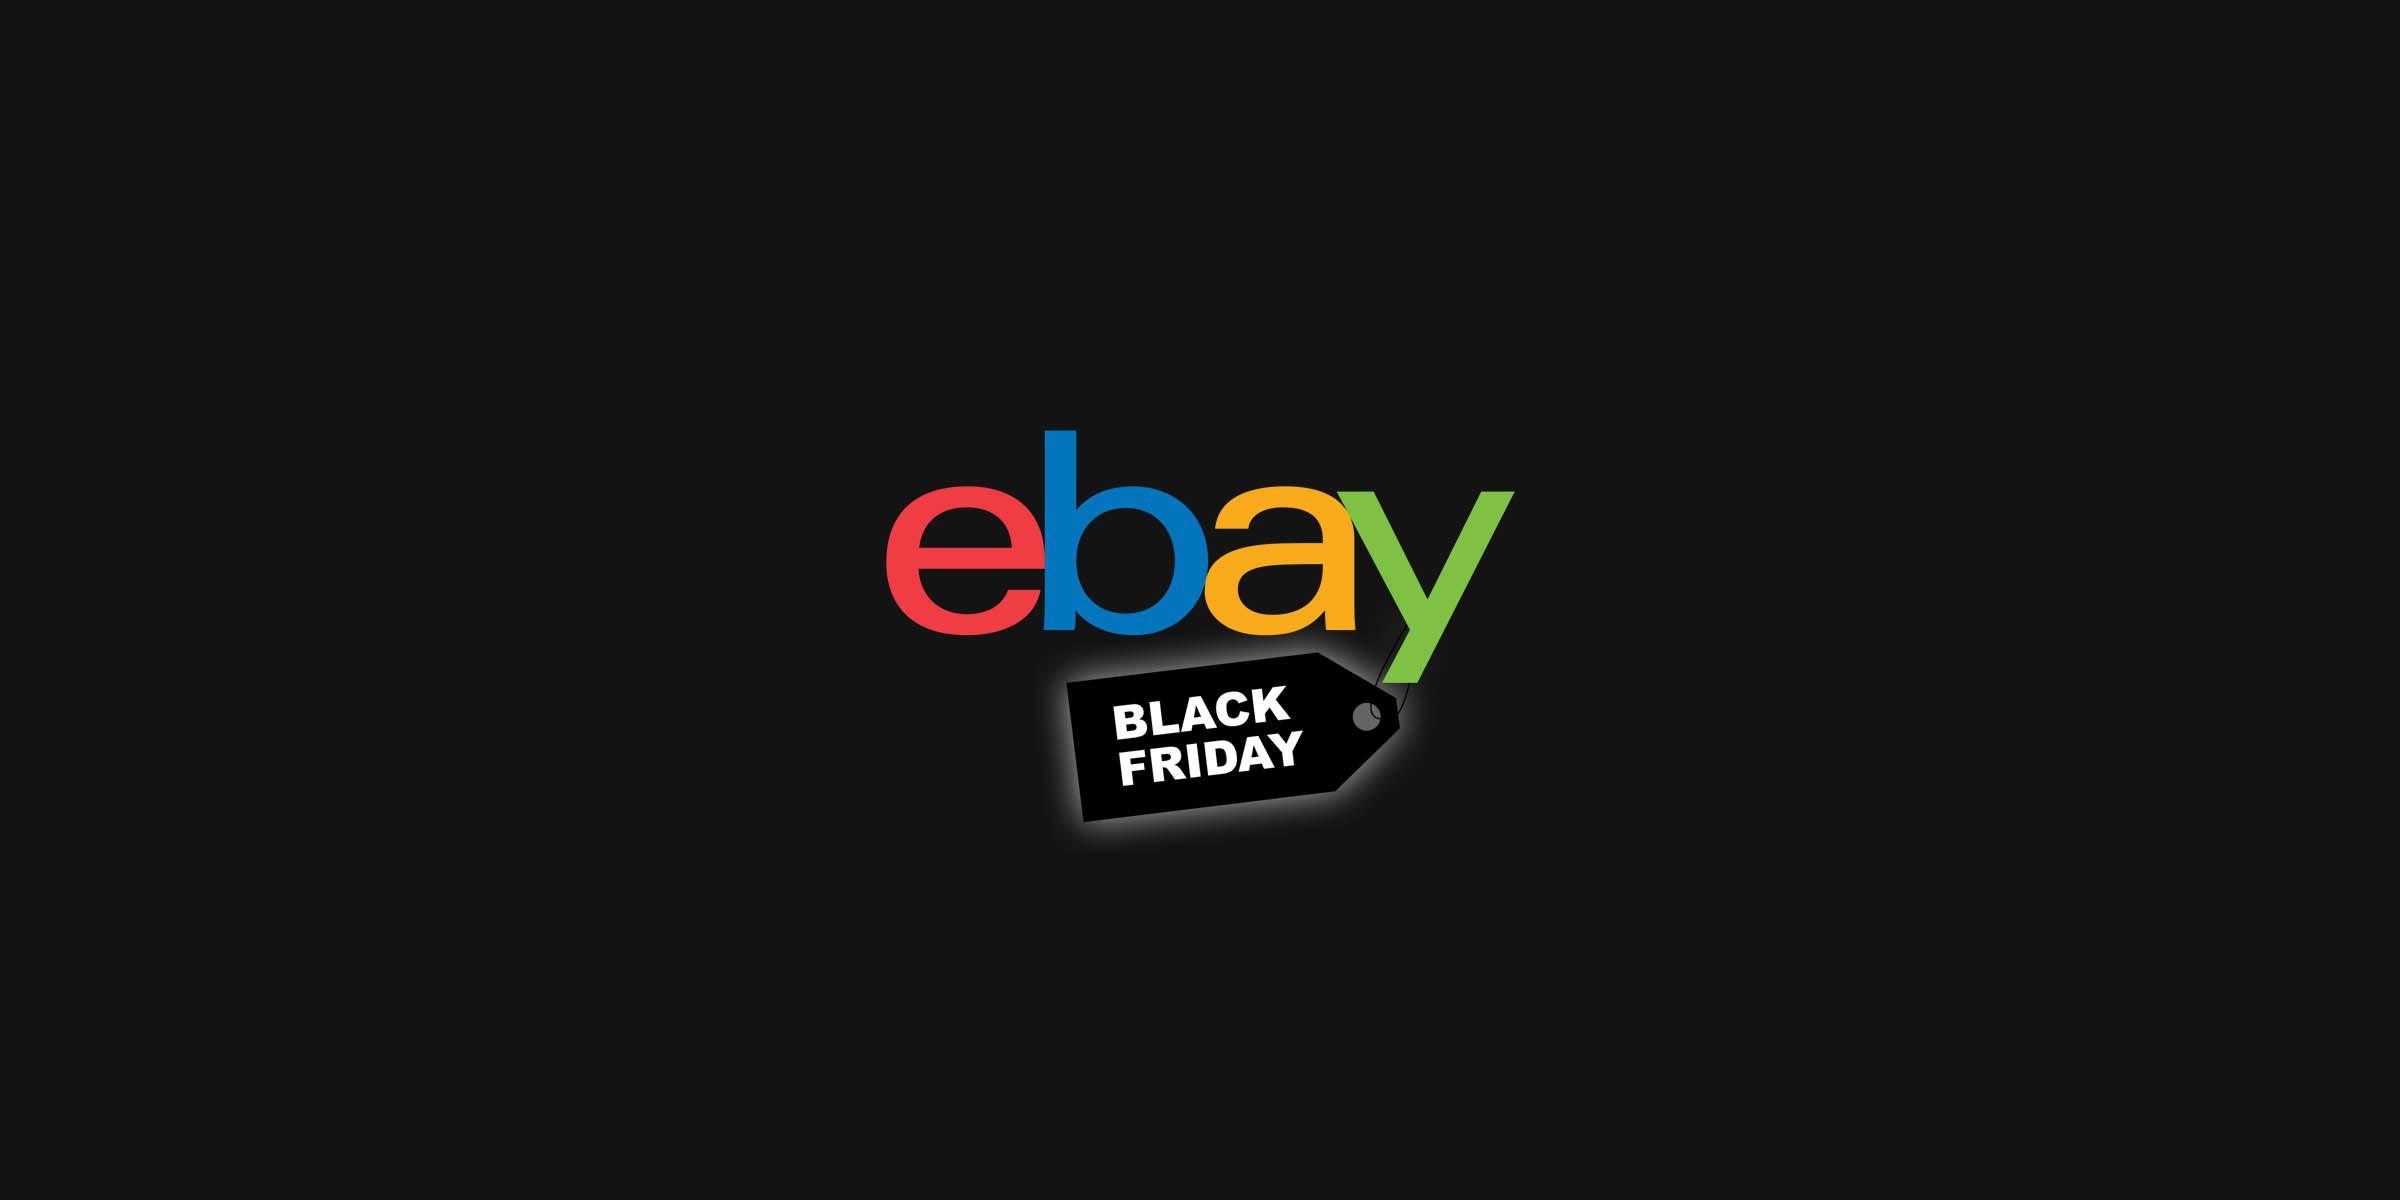 574fda0221c3a0 Black Friday: iPhone e TV Samsung in offerta su eBay